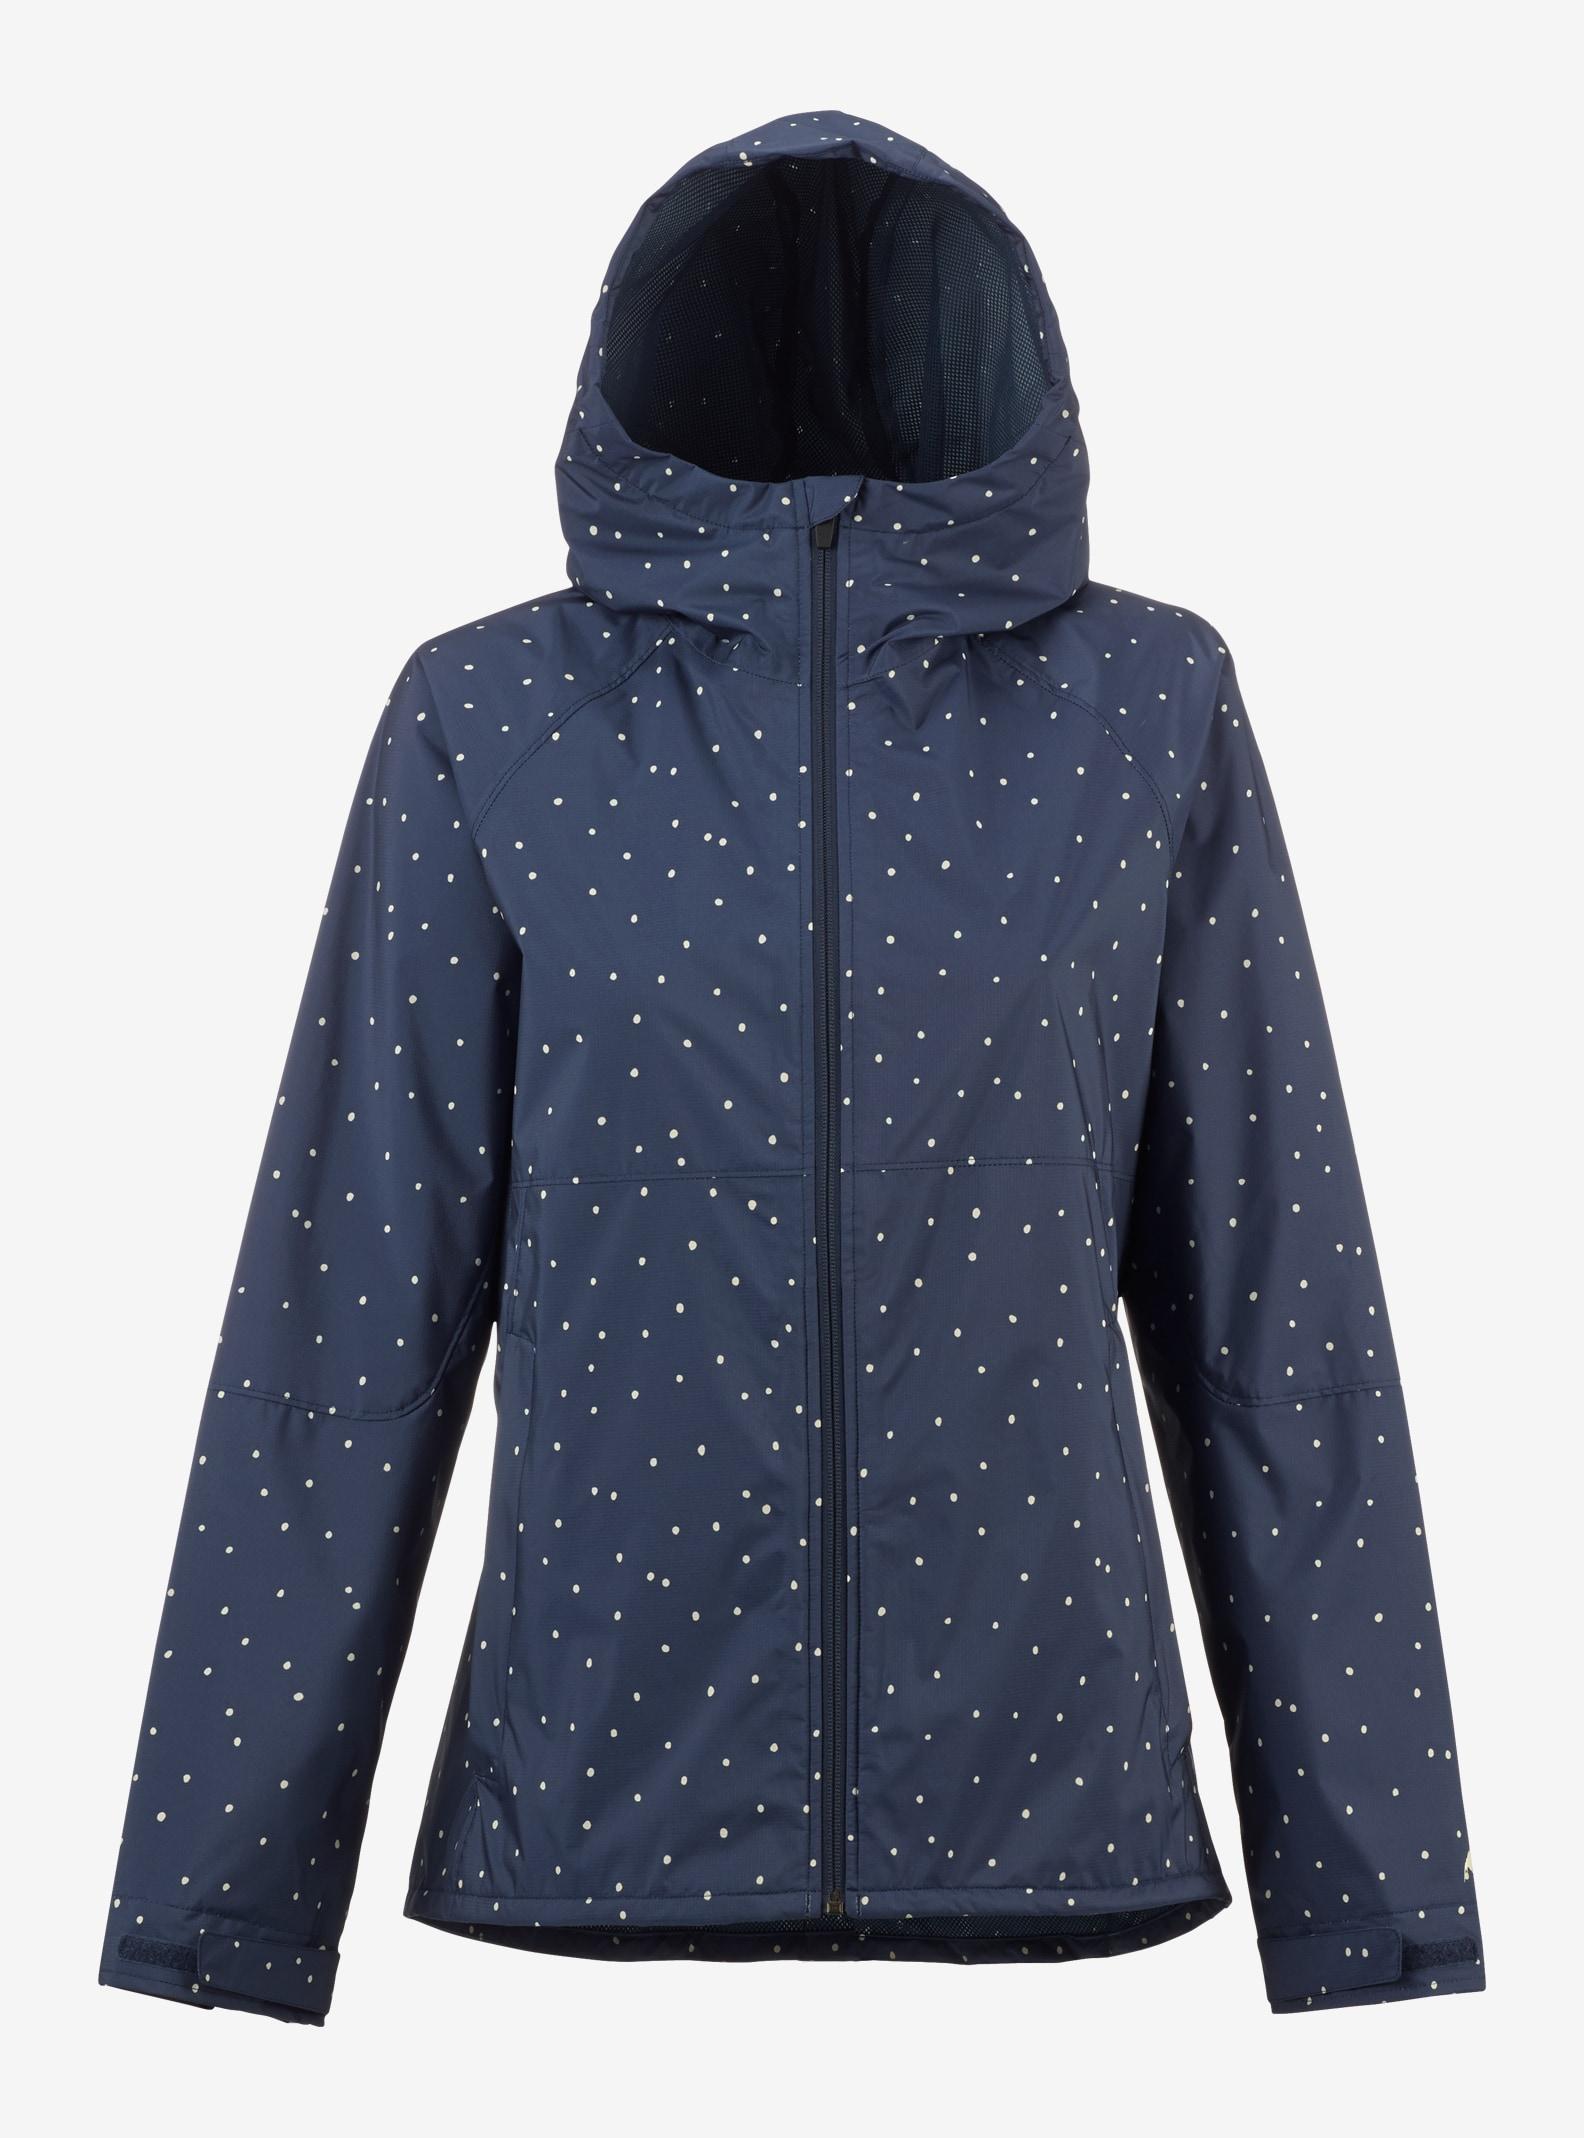 Burton Girls' Berkley Rain Jacket shown in Mood Indigo Dots